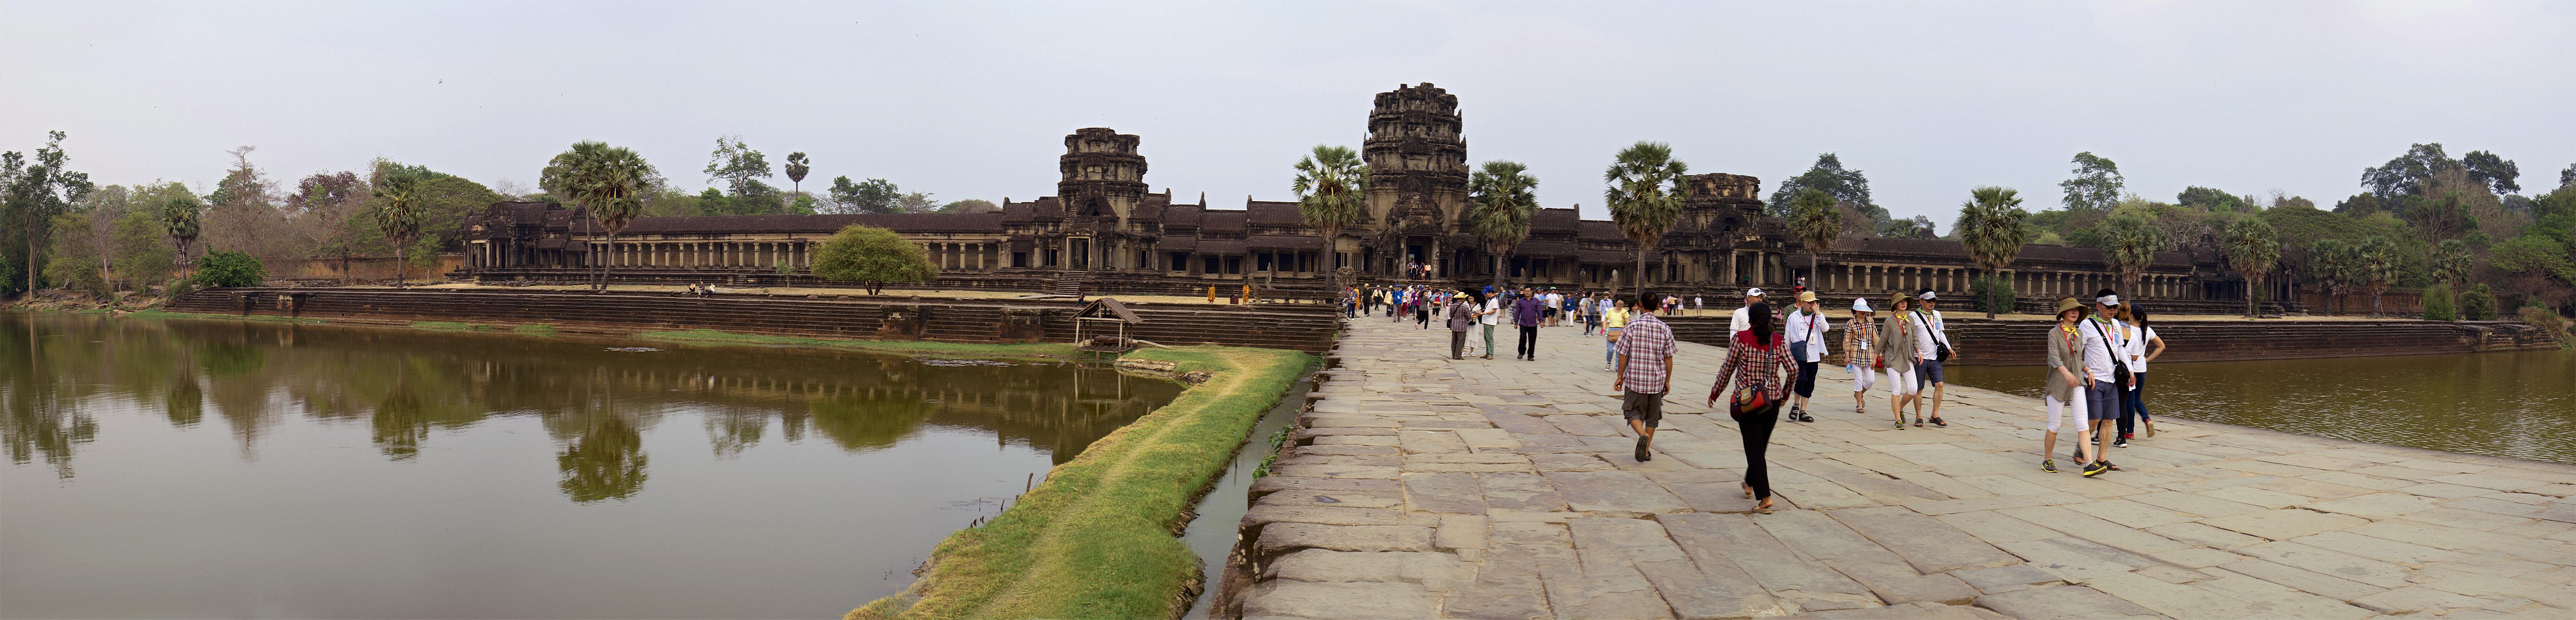 Панорама_Ангкор75разр